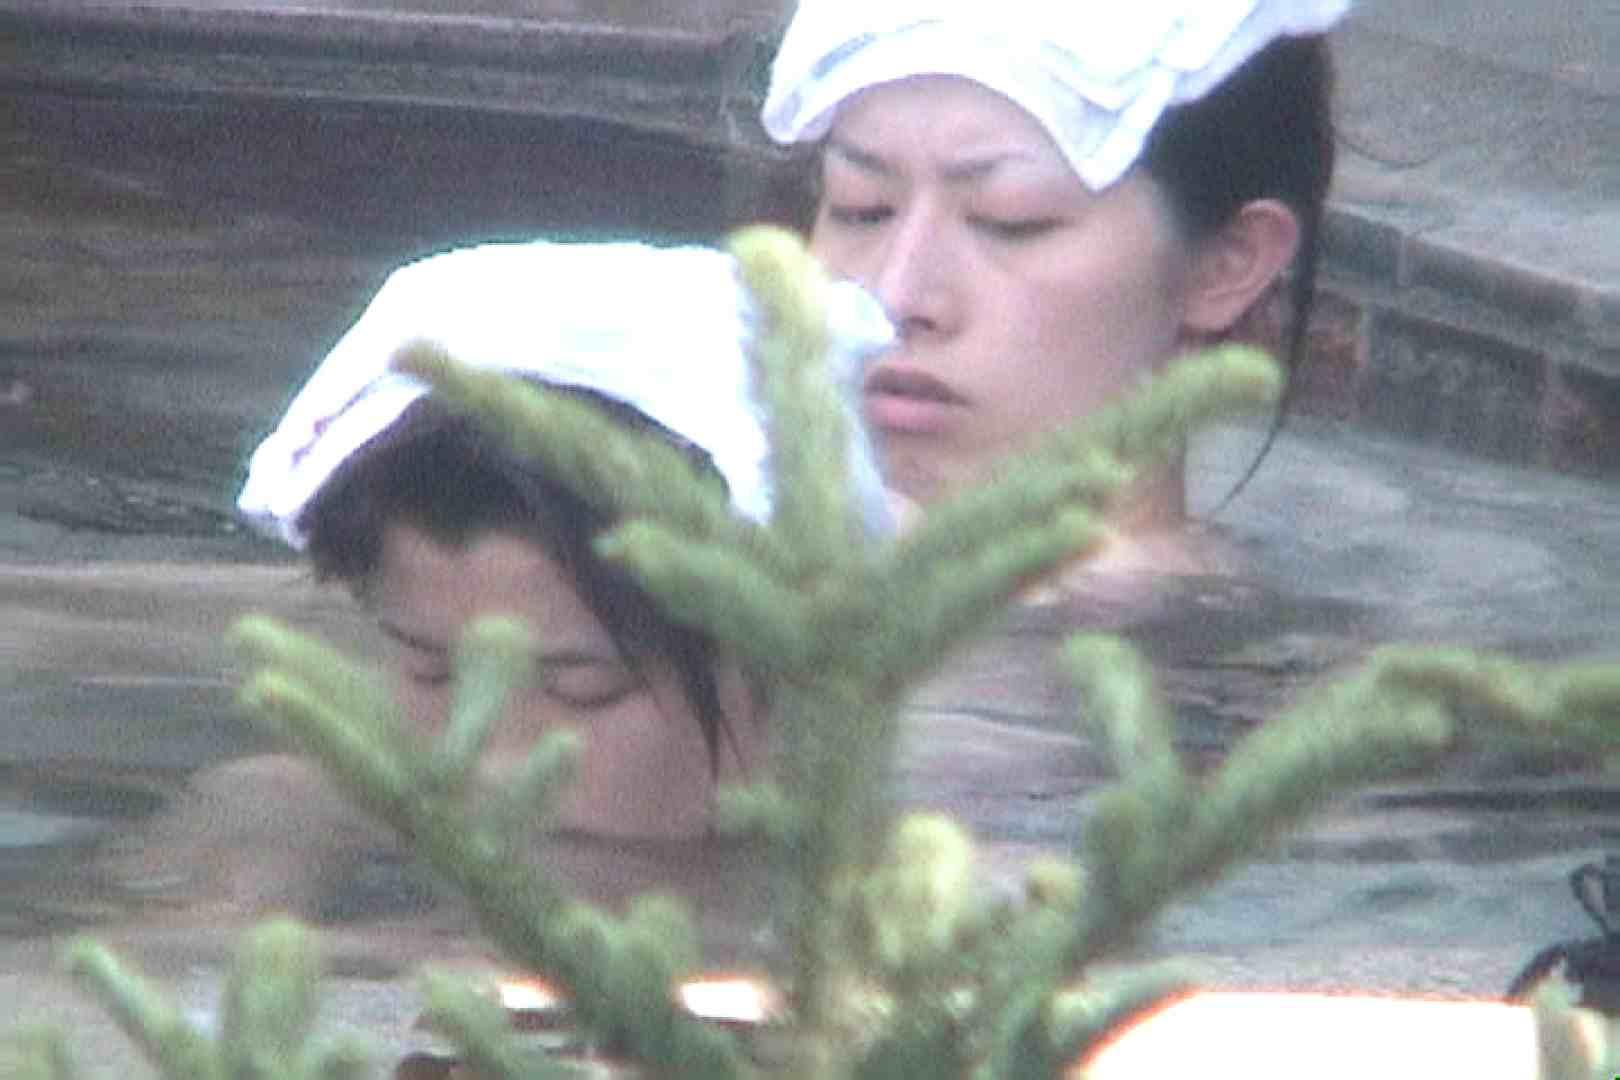 Aquaな露天風呂Vol.80【VIP限定】 露天風呂編   盗撮シリーズ  76PIX 55